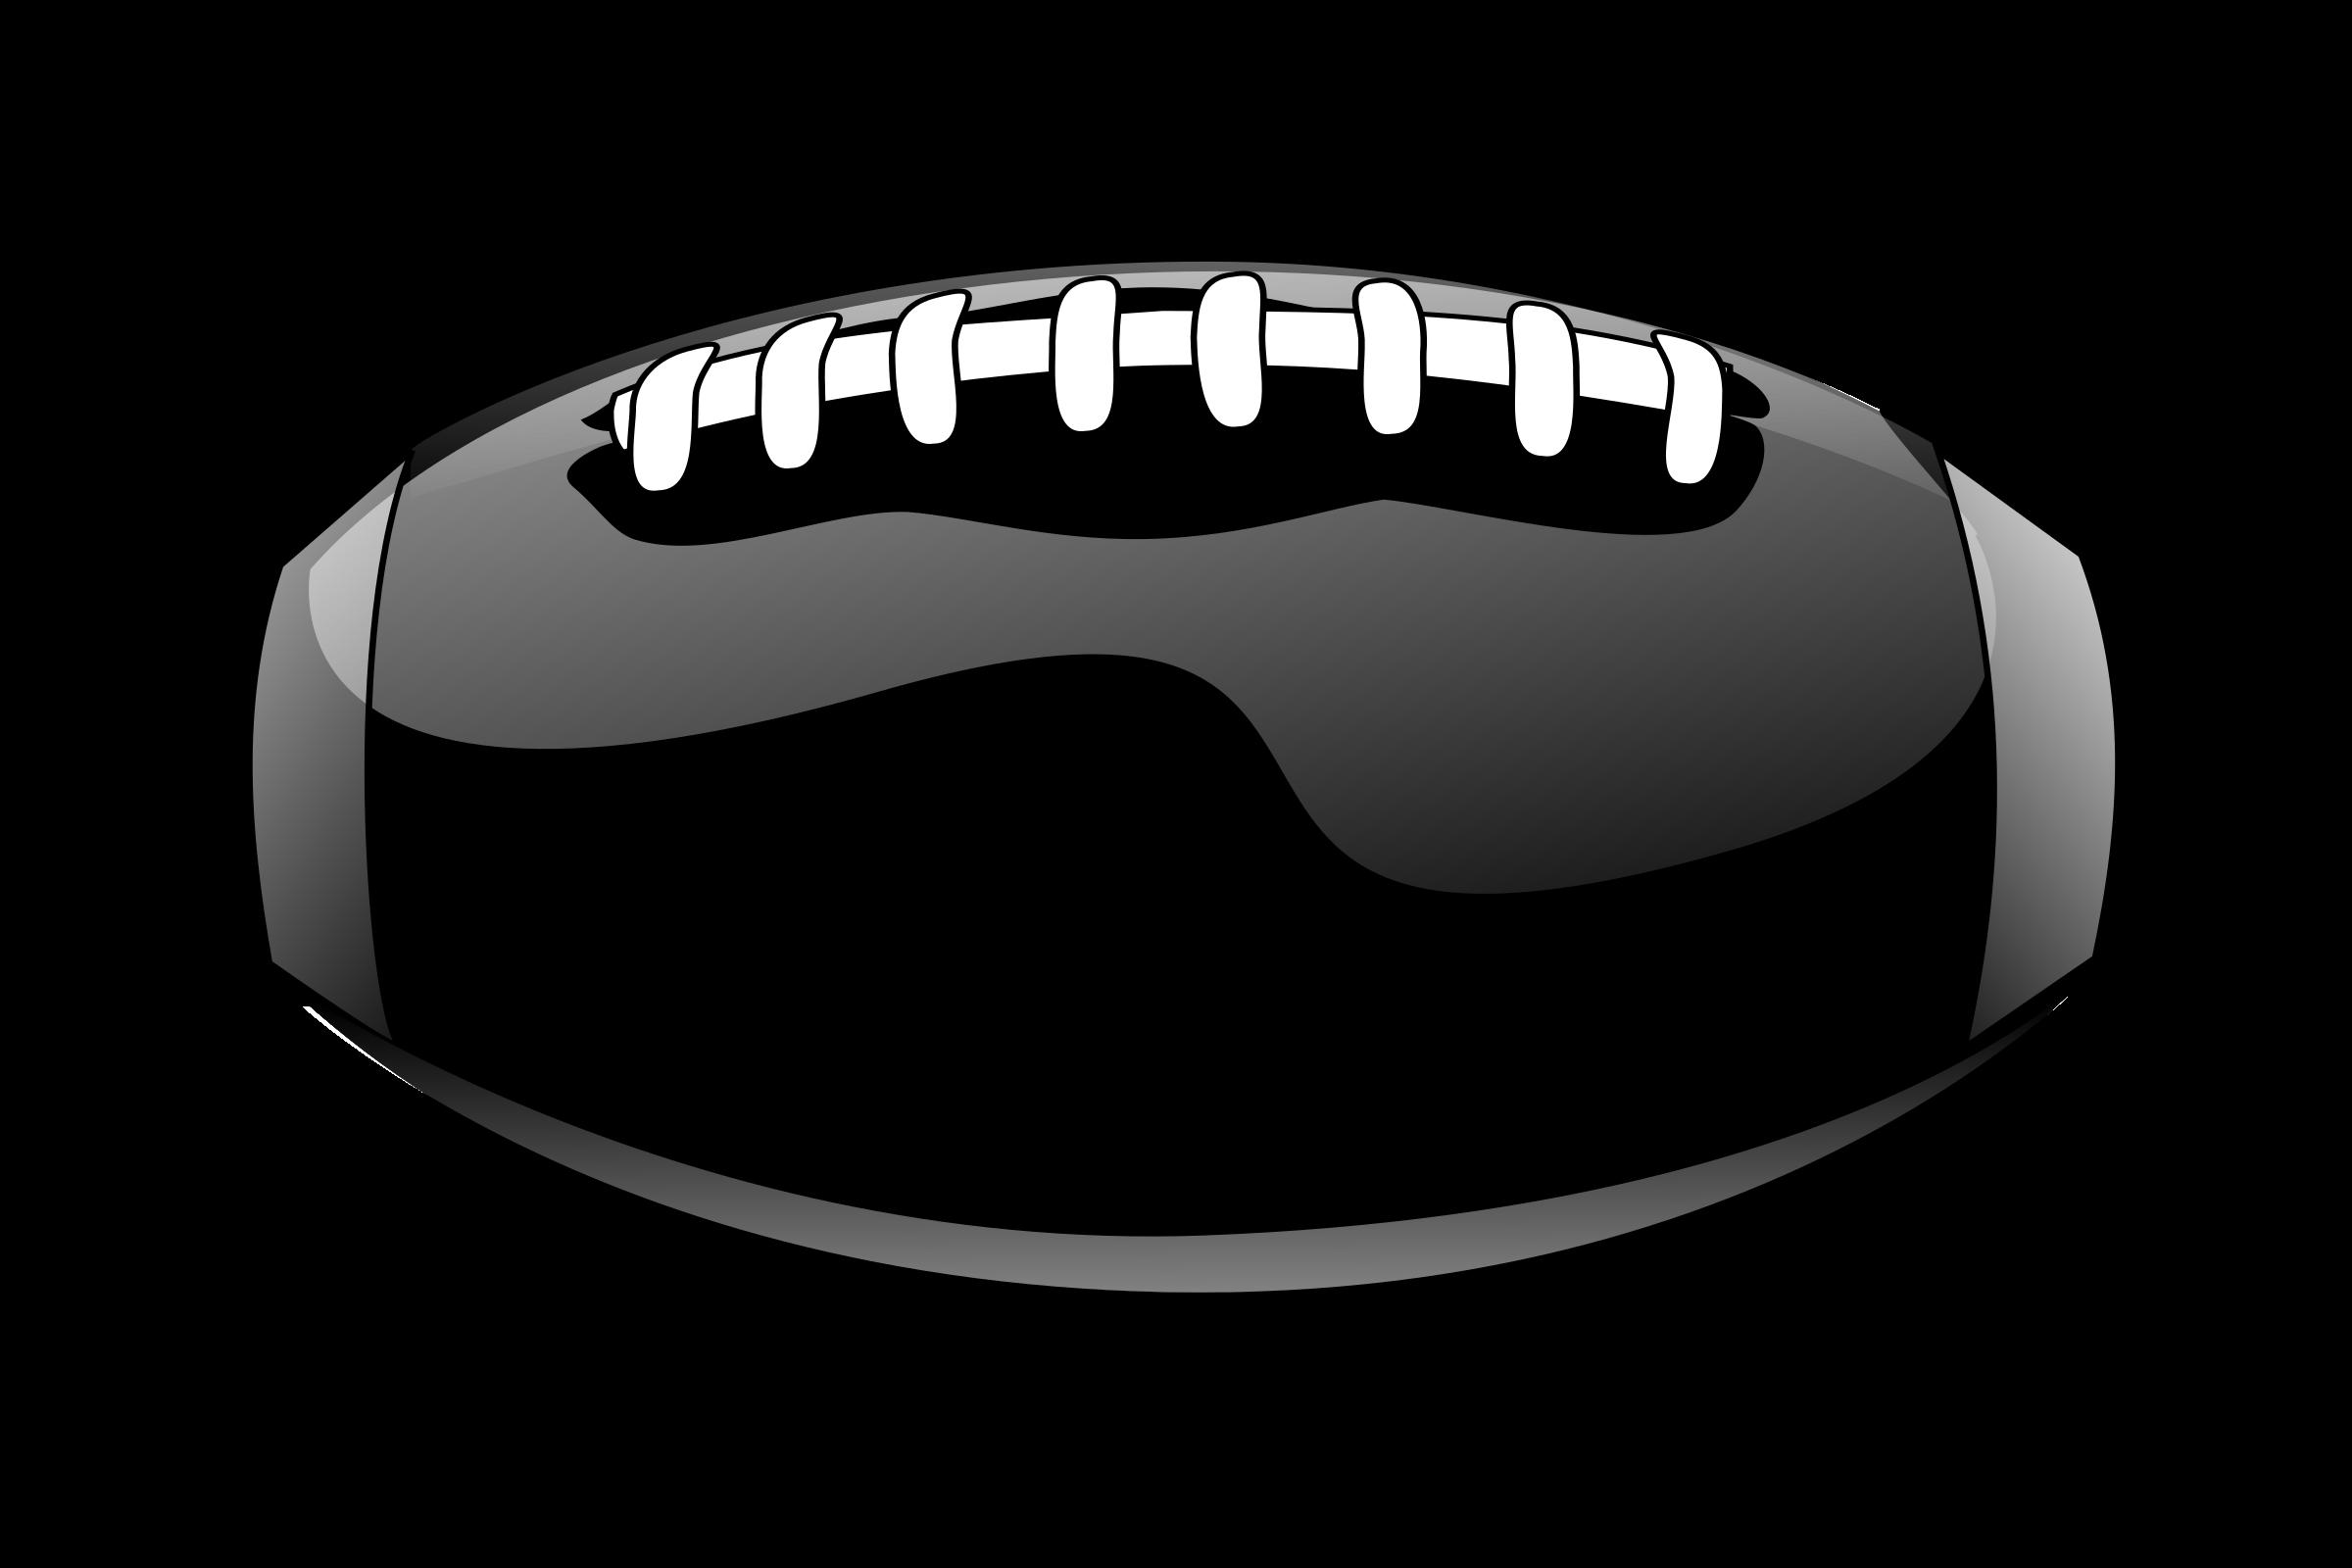 American Football Png Image American Football Football Ball Football